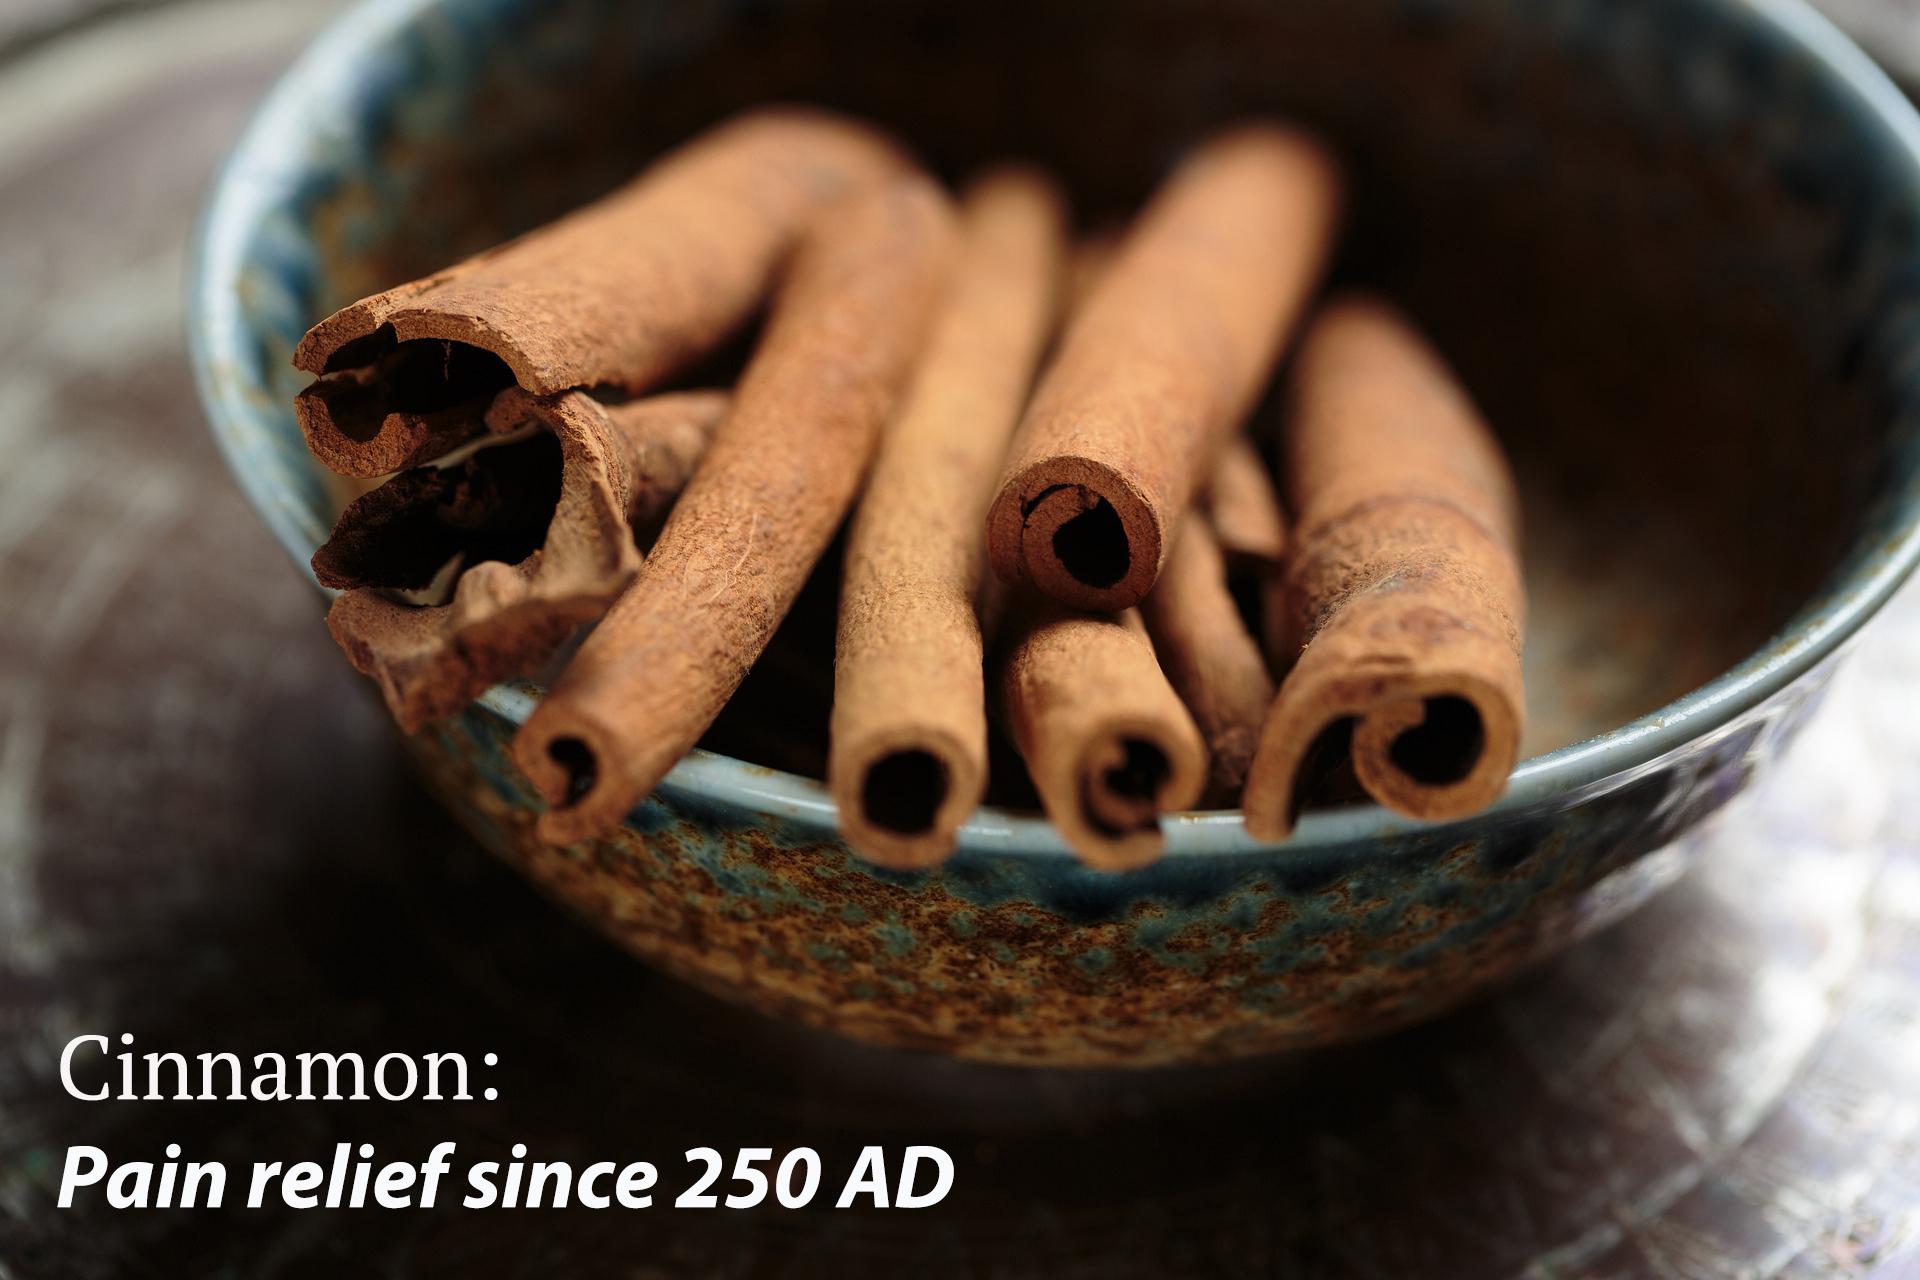 CinnamonSticksPainRelief.jpg